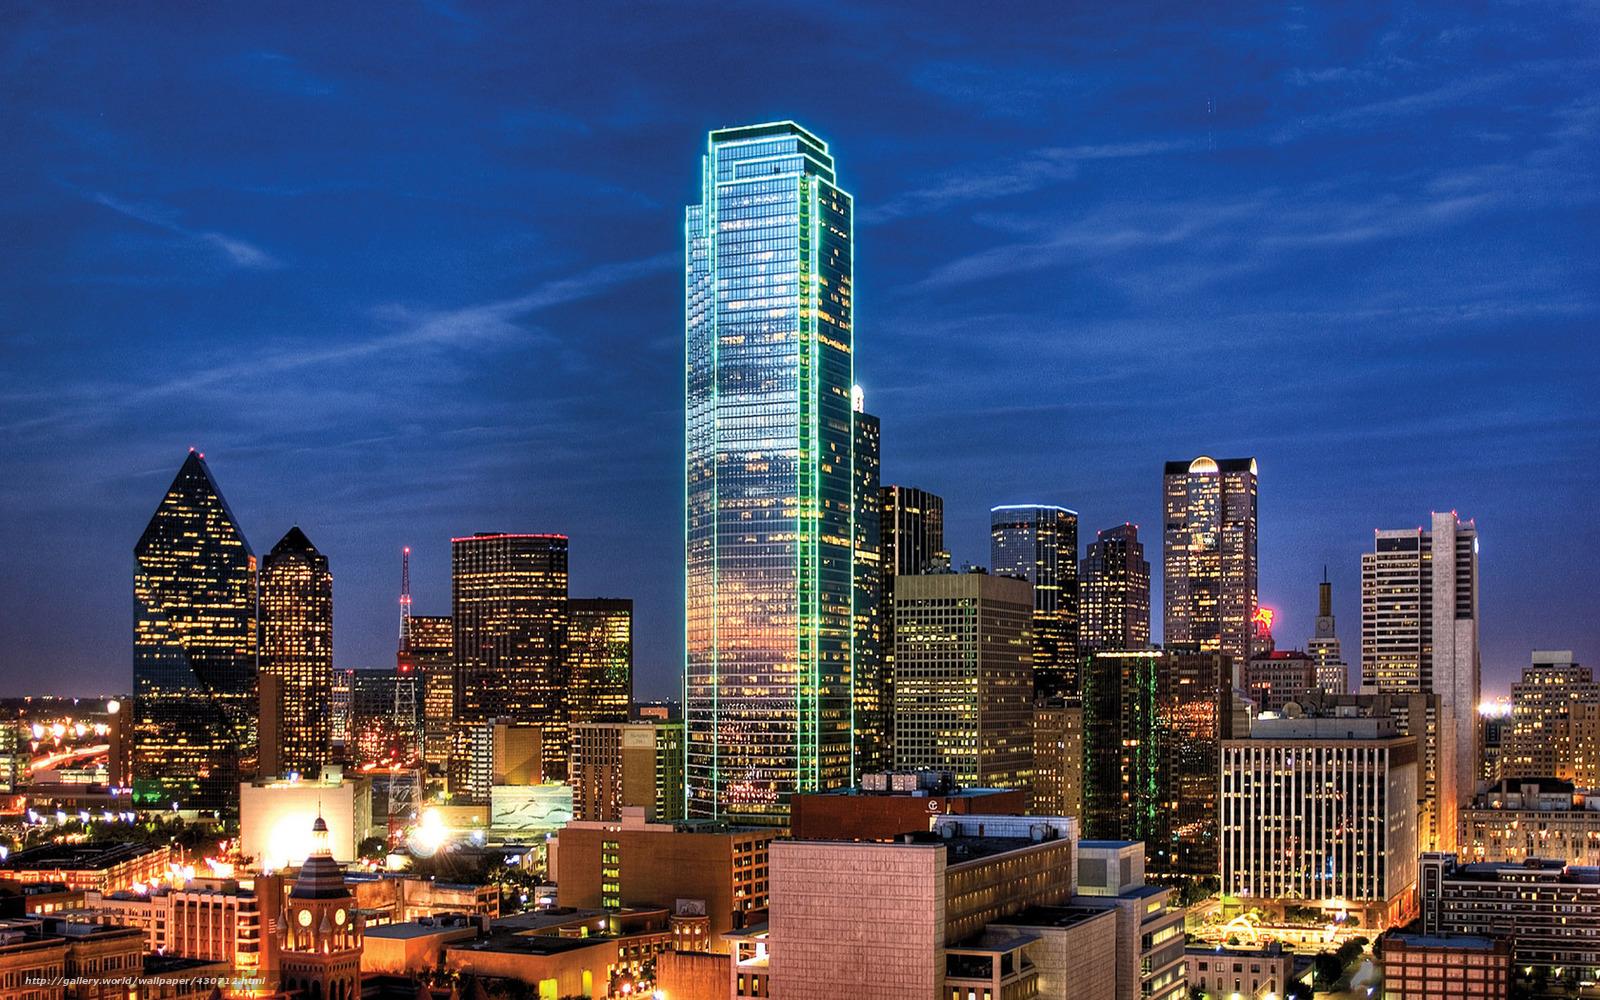 Download wallpaper USA Texas Dallas city free desktop wallpaper in HD Wide Wallpaper for Widescreen